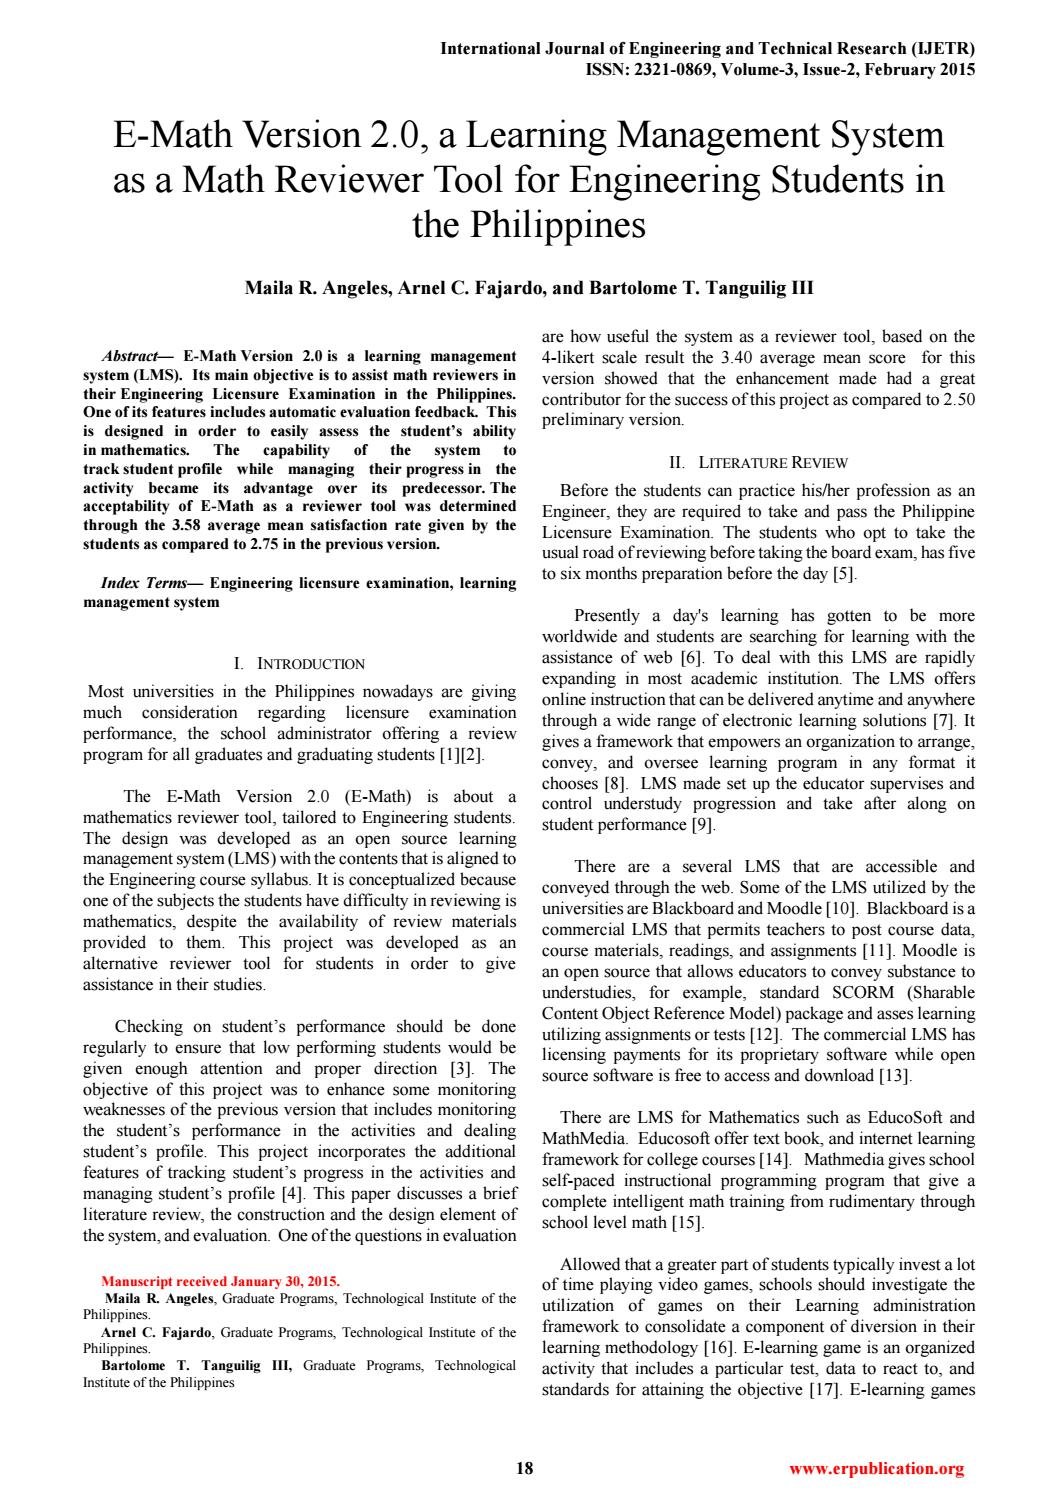 Ijetr031307 by International Journal of Engineering